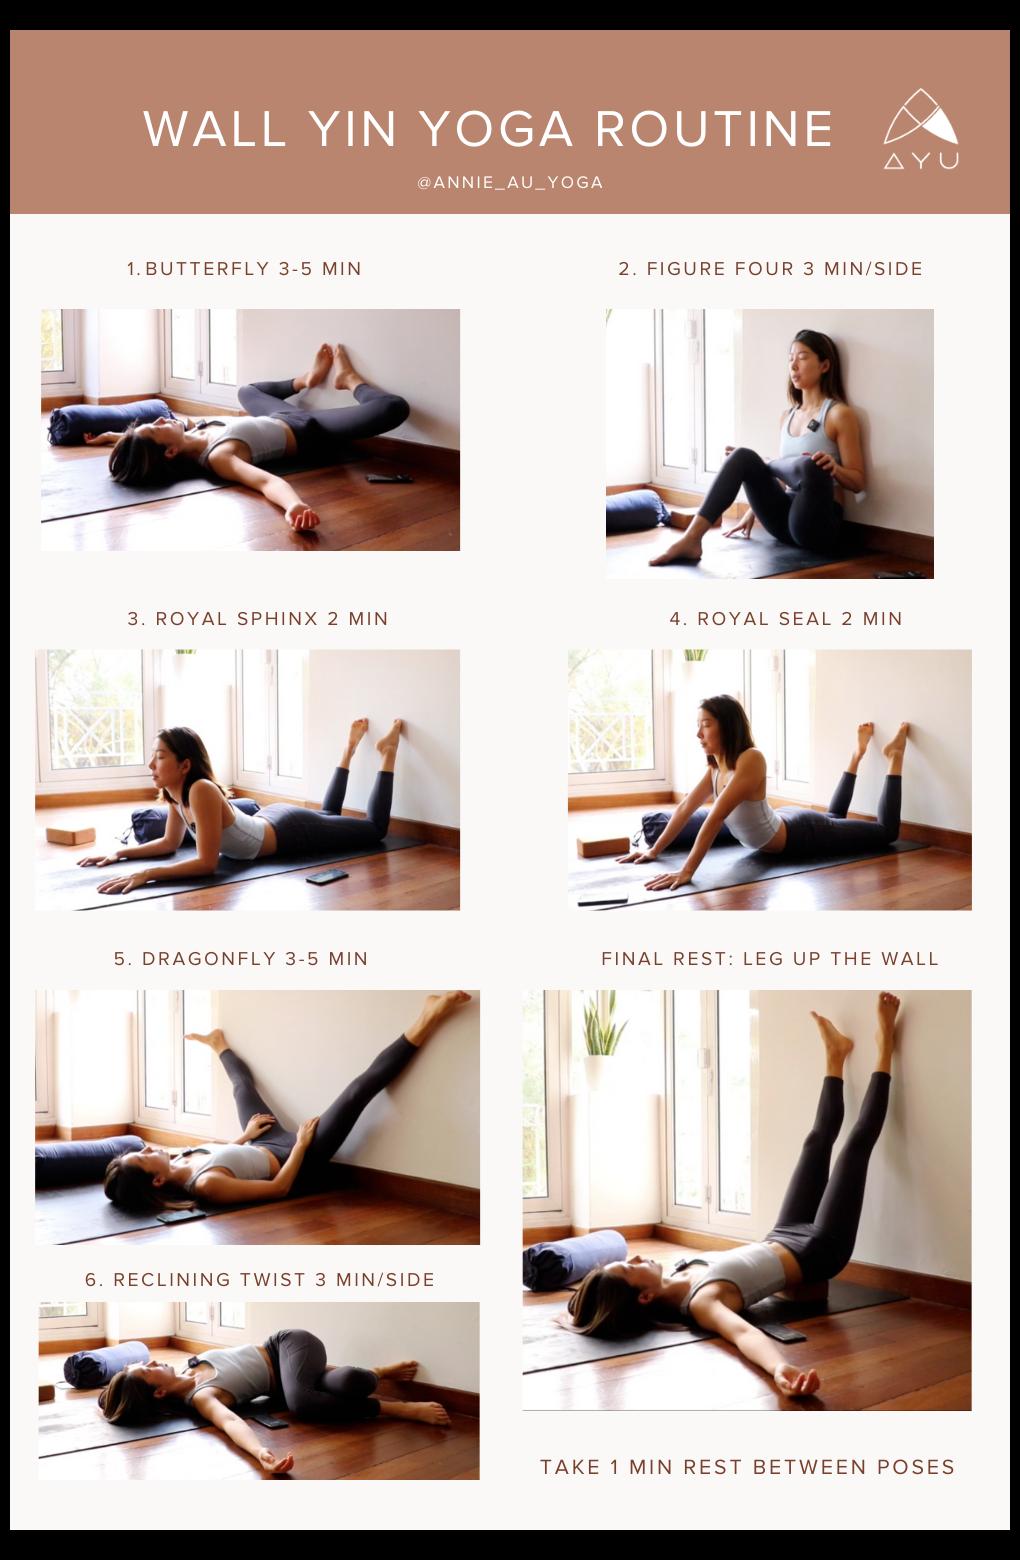 Free Wall Yin Yoga For Flexibility And Relaxation Yin Yoga Hamstrings Yinyogahamstrings Includes A Downl Yin Yoga Sequence Wall Yoga Restorative Yoga Poses